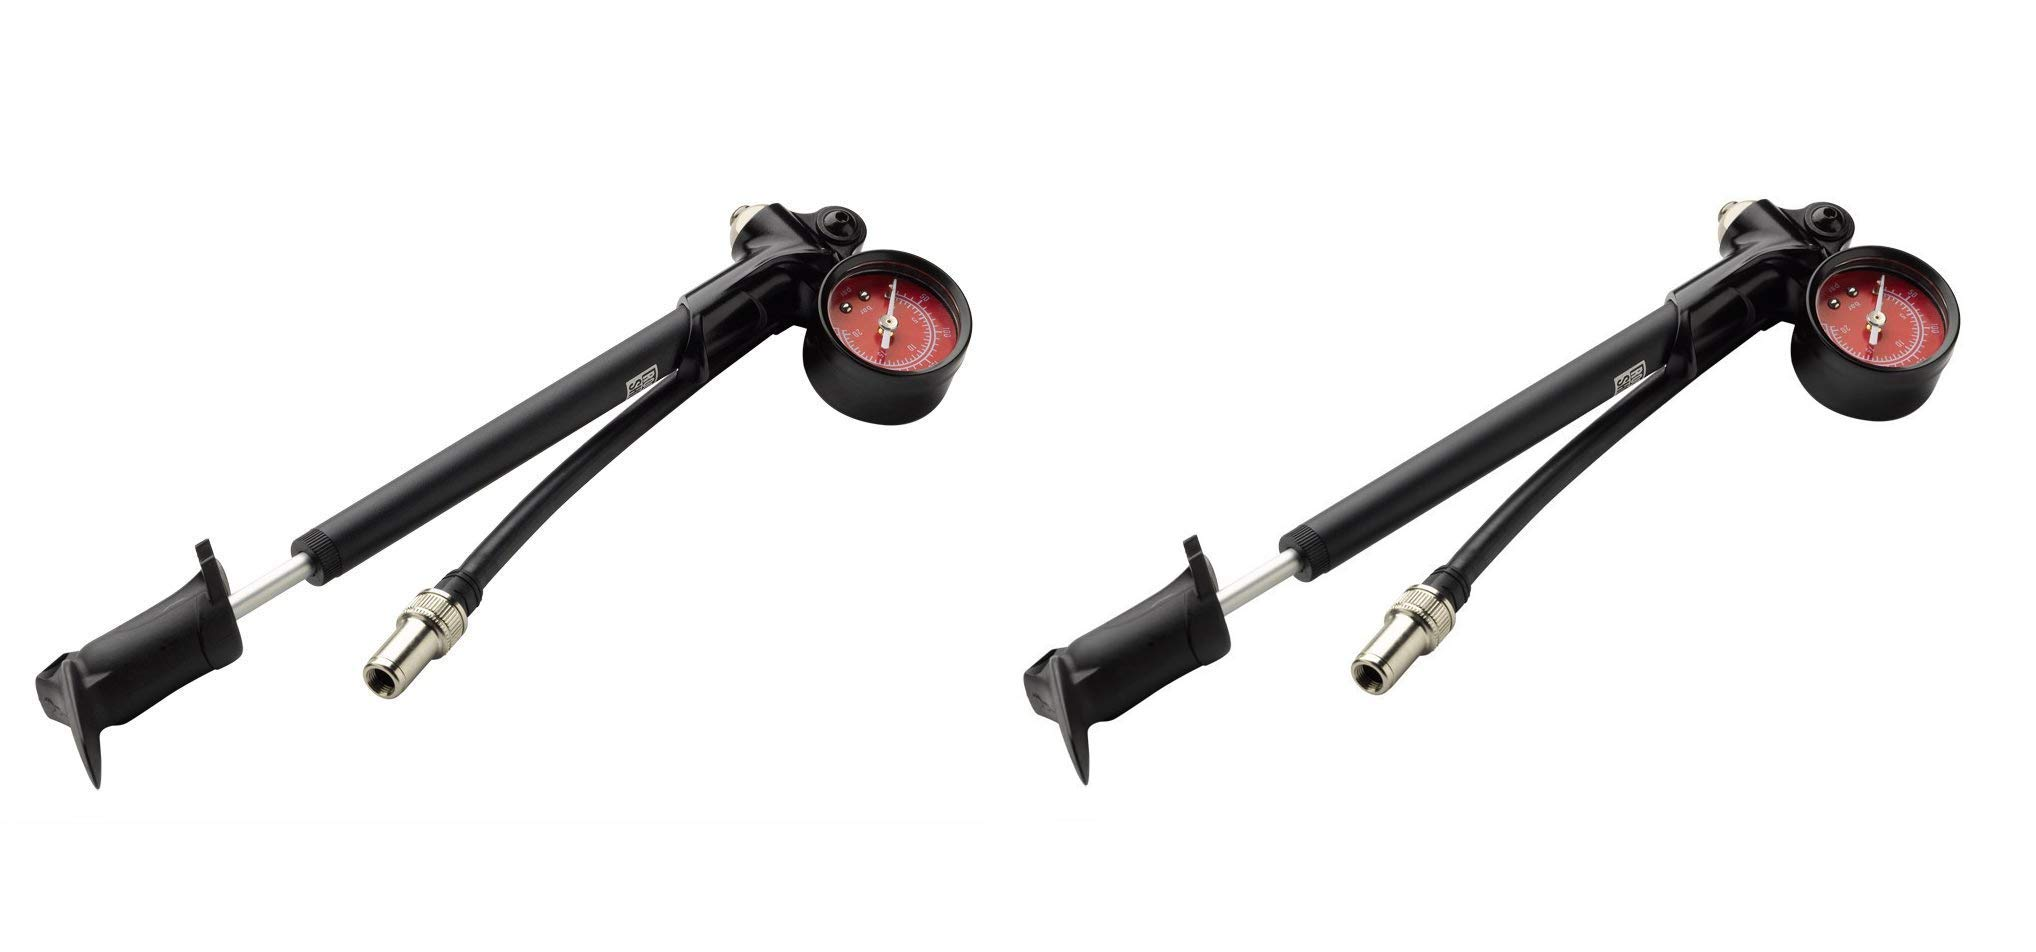 RockShox High-Pressure Shock Pump (300 psi max) (Twо Pаck) by RockShox